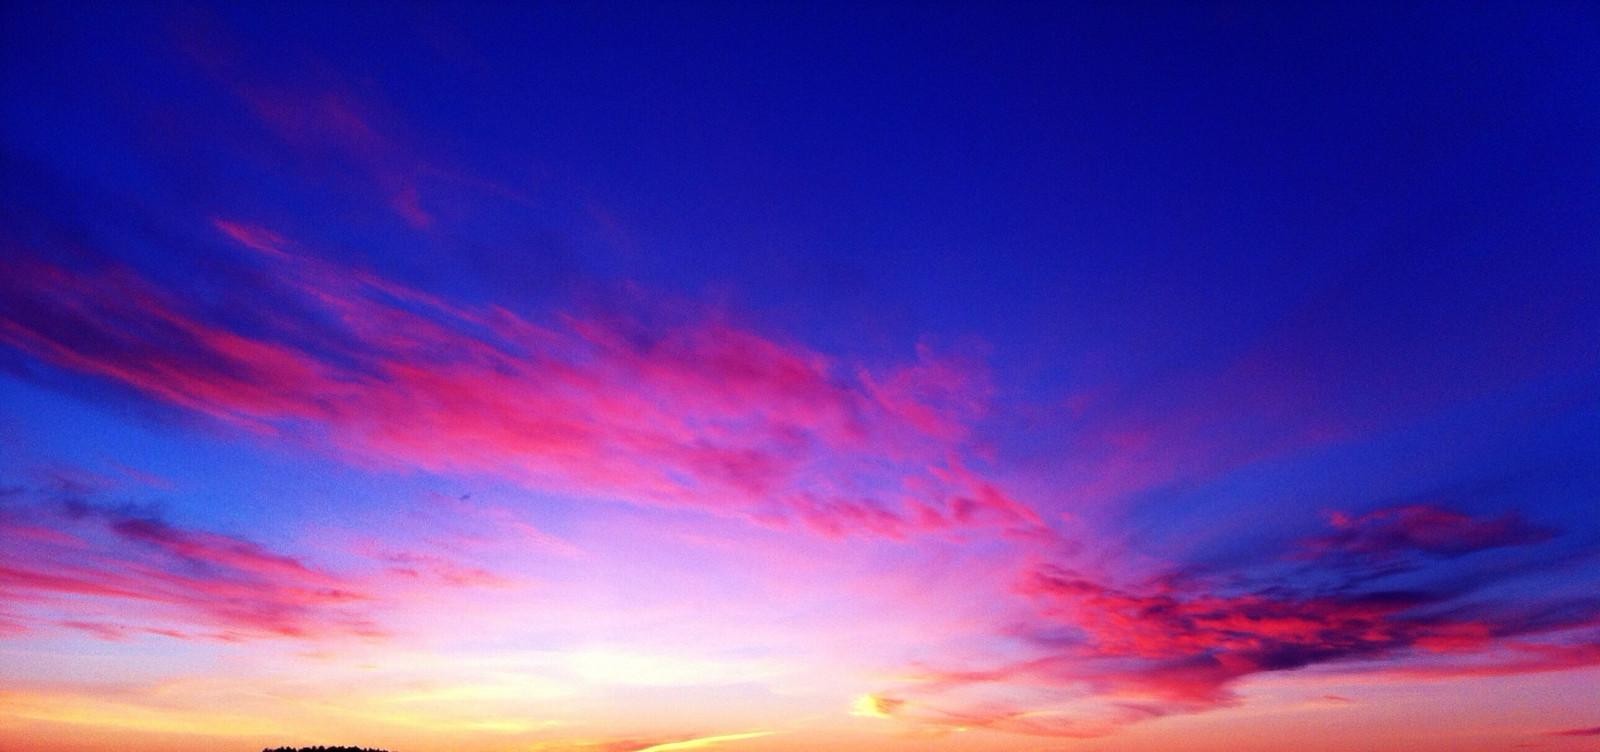 Wallpaper : pink, blue, sunset, sky, orange, cloud, night, clouds, colorful, purple ...